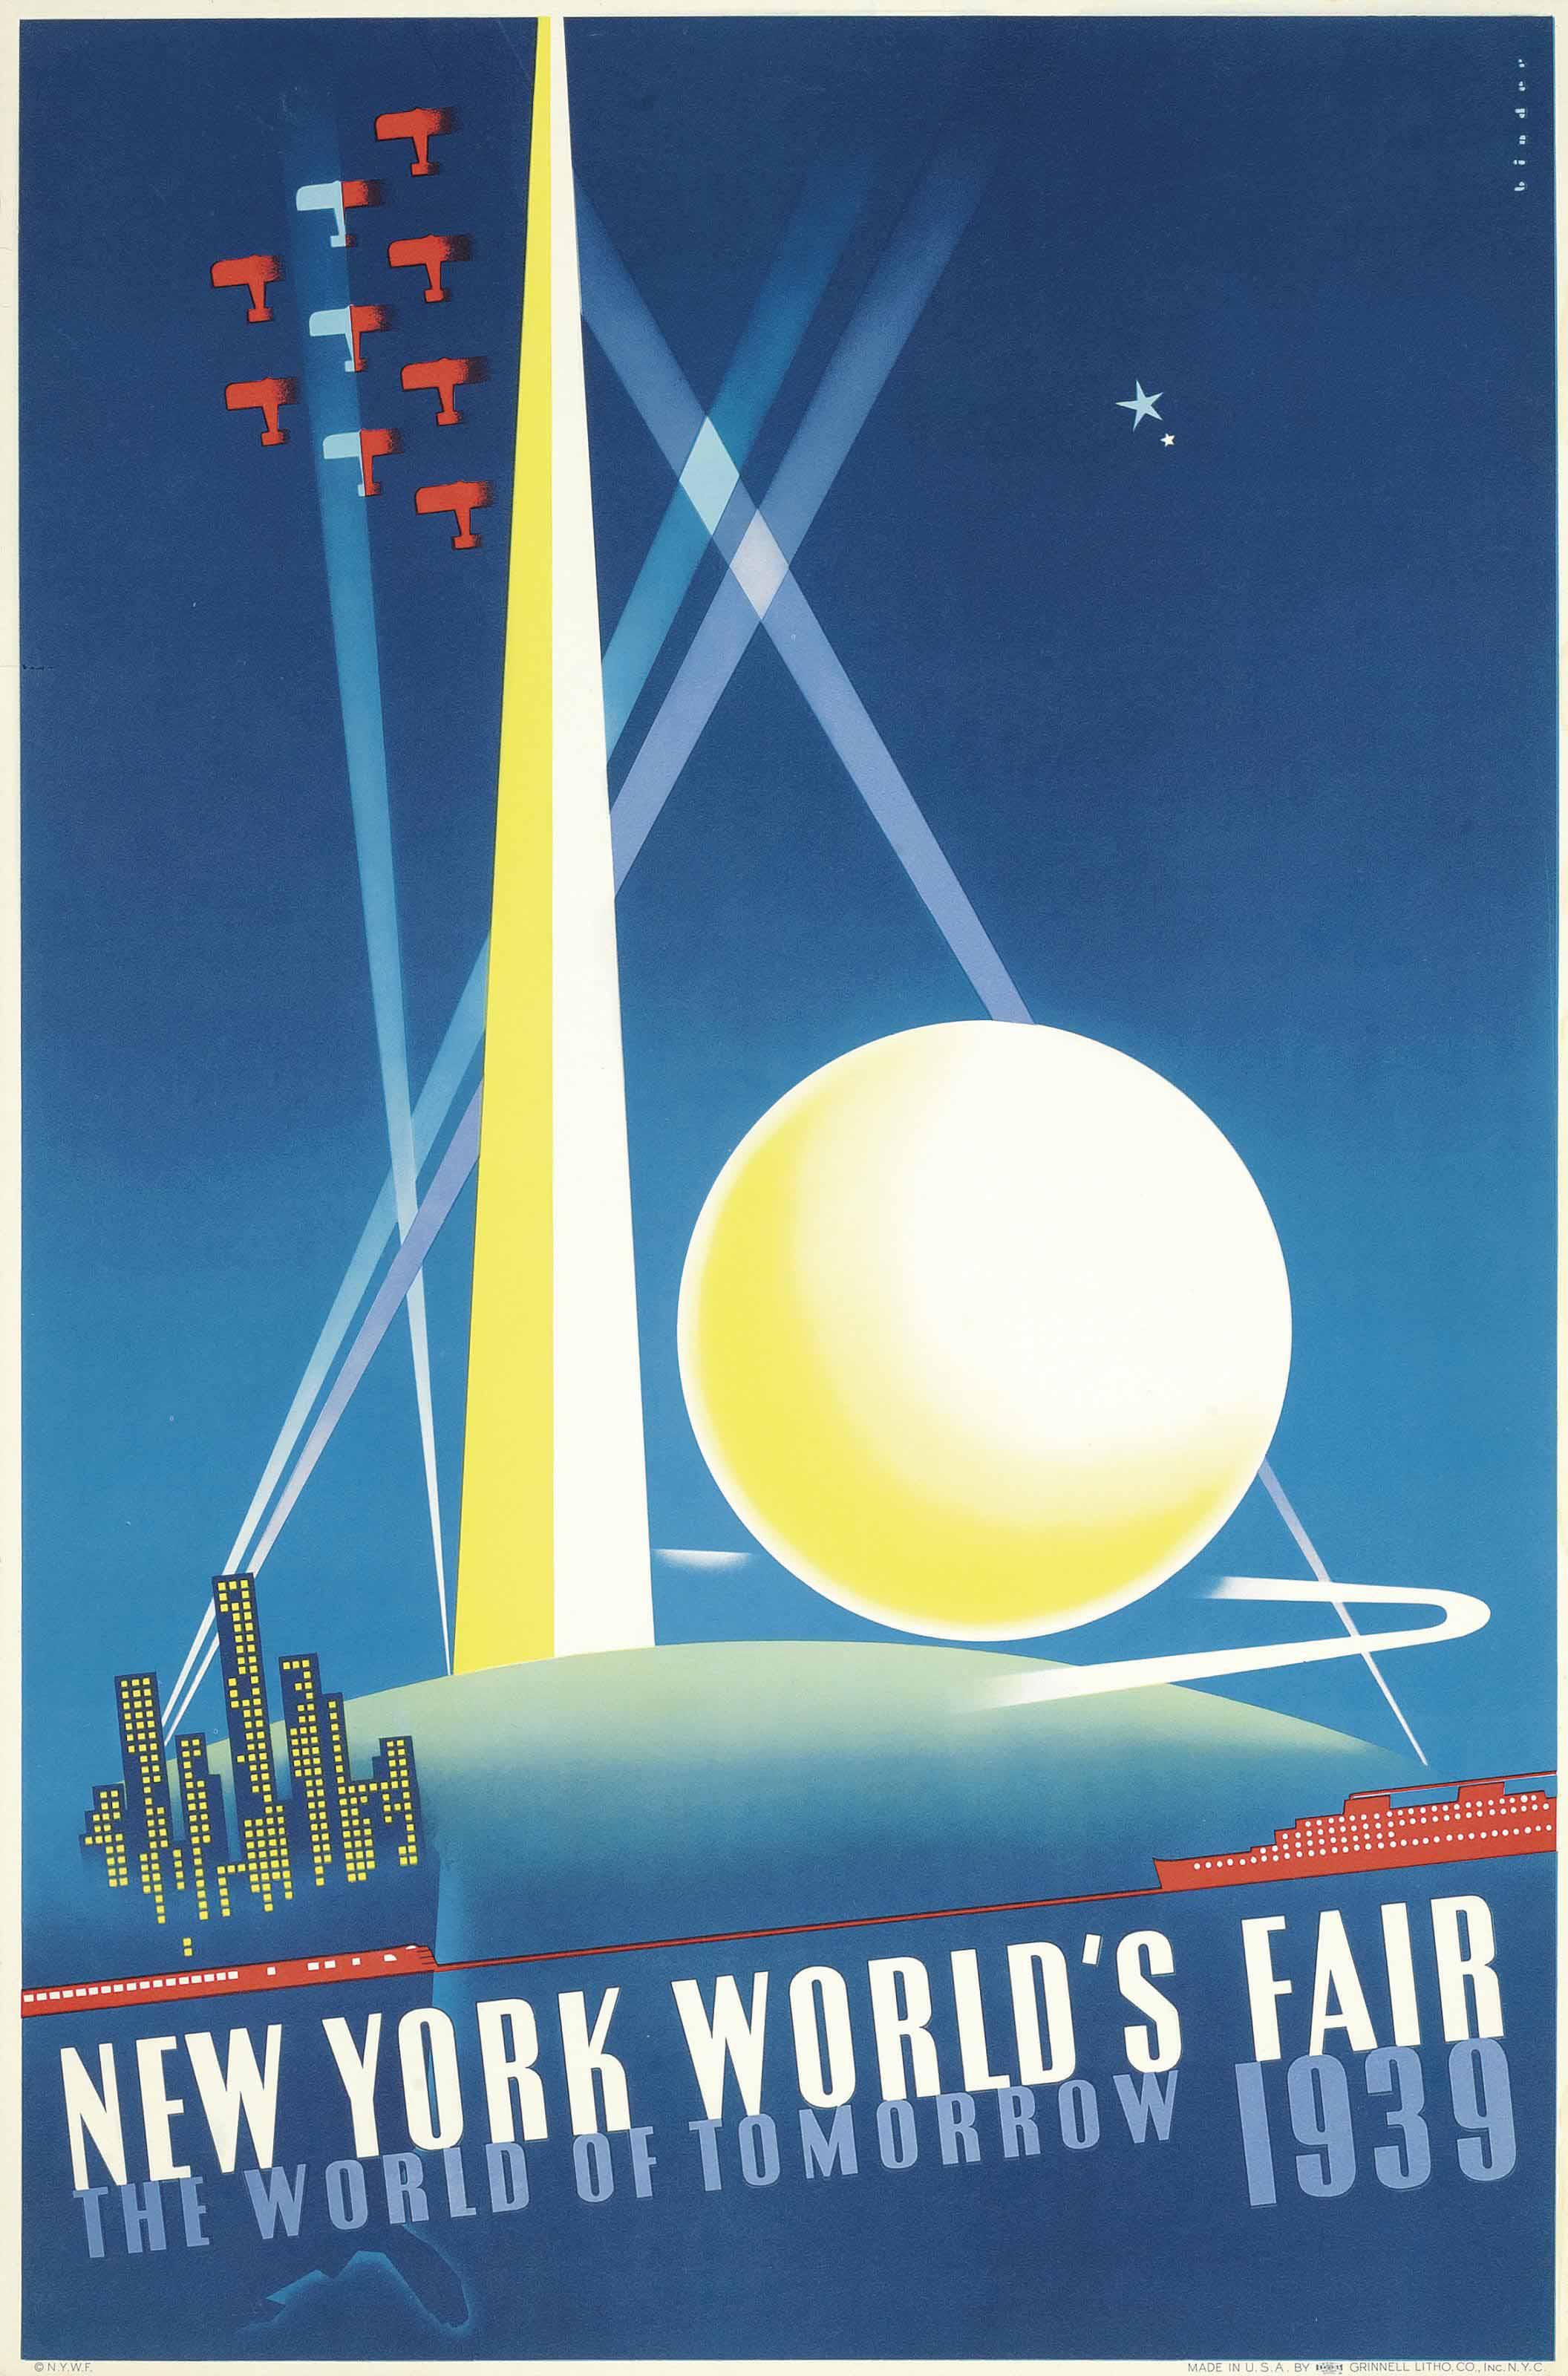 NEW YORK WORLD'S FAIR, THE WORLD OF TOMORROW